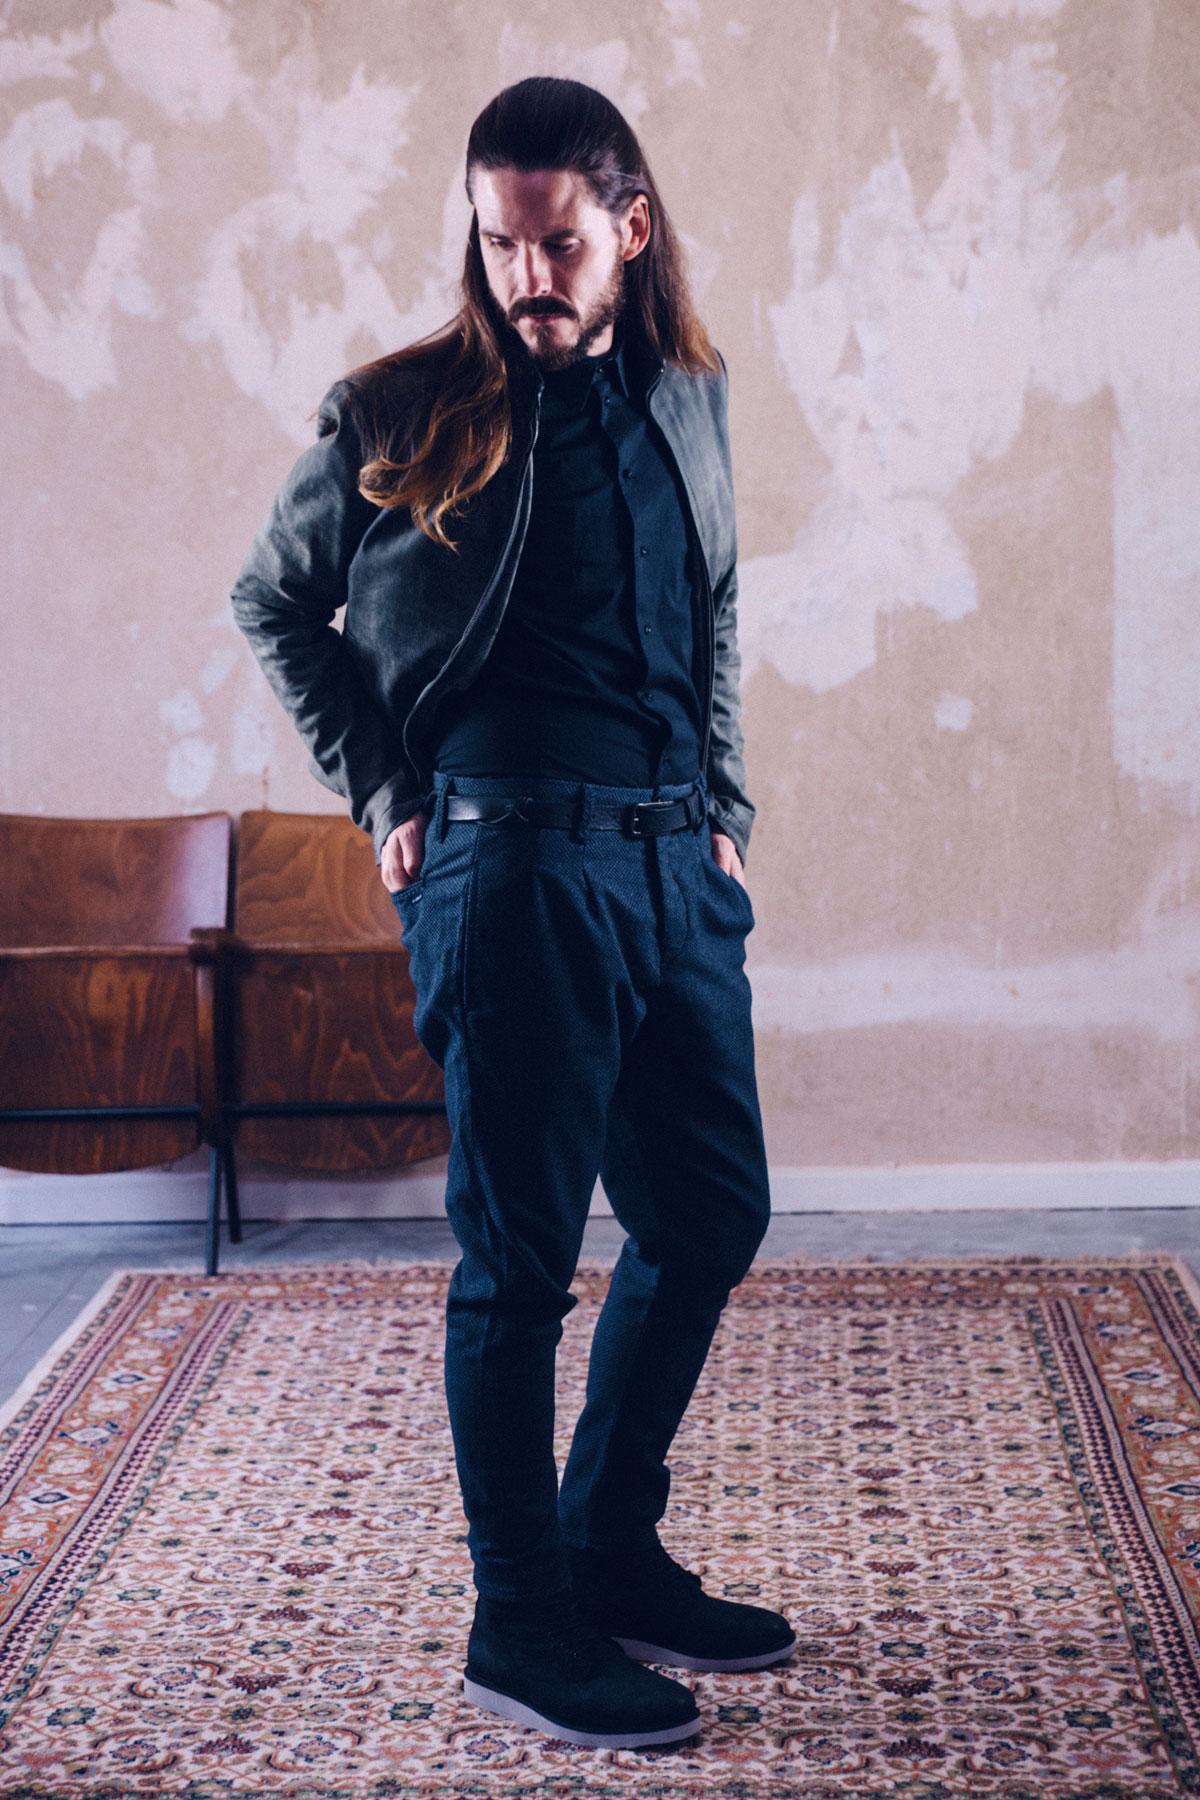 modeblog-maenner-malefashion-blog-gabba-outfit-lederjacke-chino-herbstlook